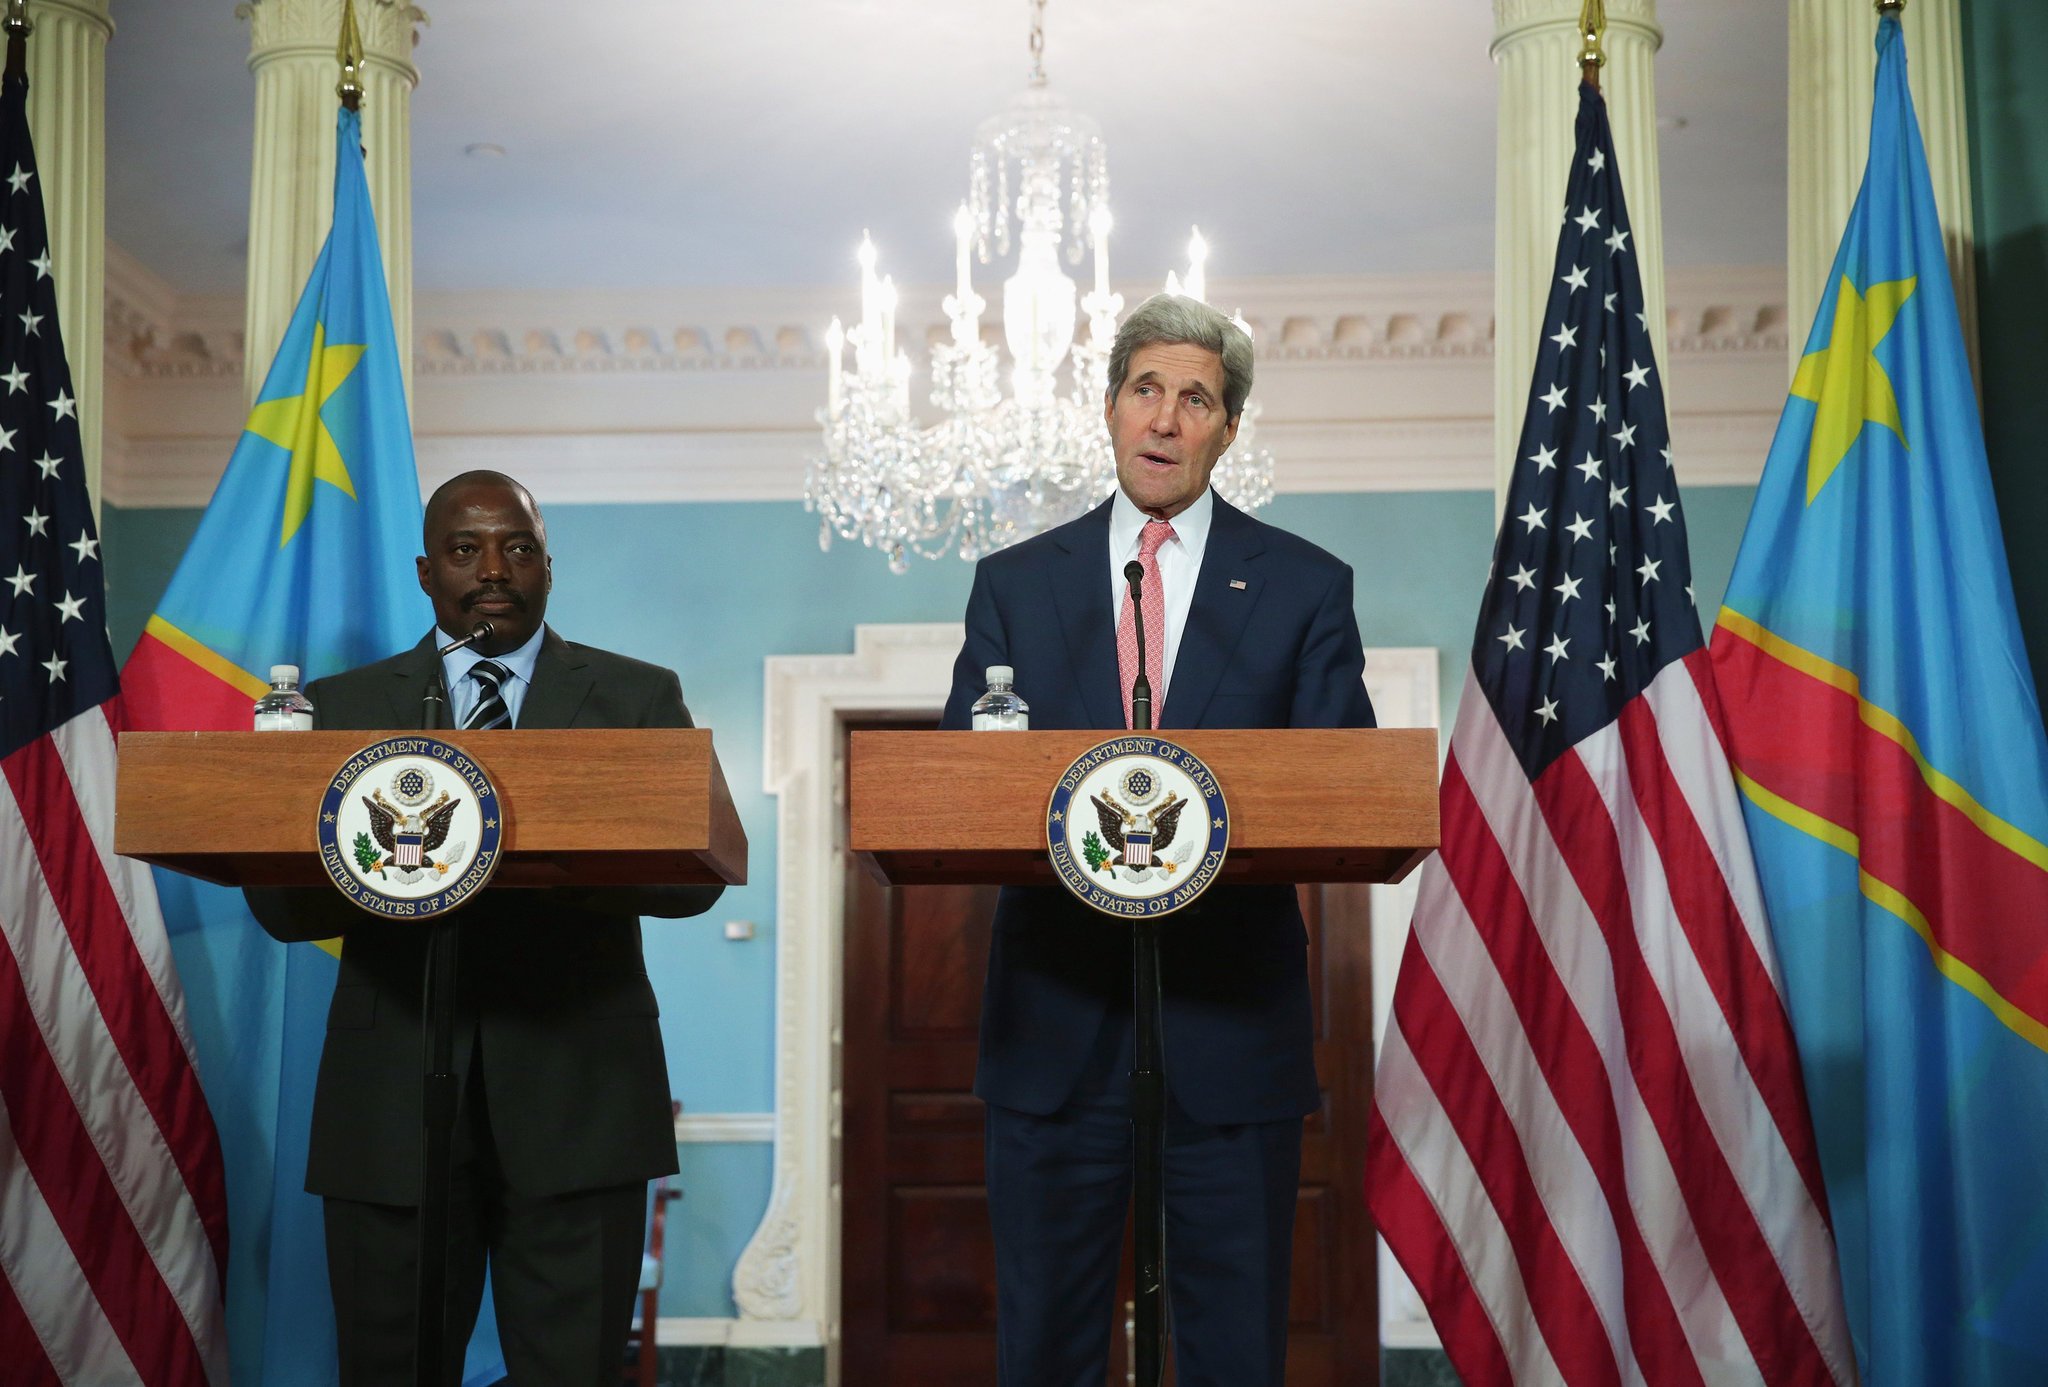 Secretary of State John Kerry and Joseph Kabila, president of the Democratic Republic of Congo, speaking in Washington on Monday. ALEX WONG / GETTY IMAGES